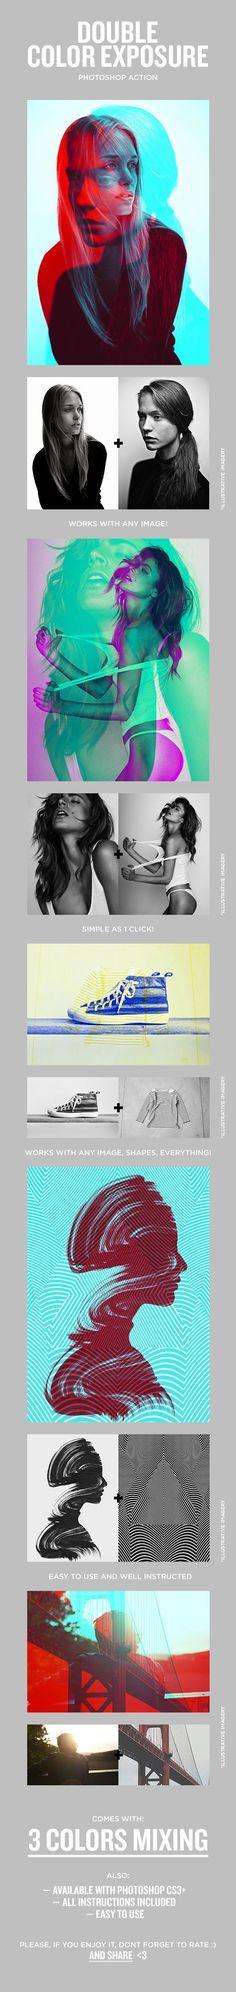 Double Color Exposure Photoshop Action #photoeffect Download: http://graphicriver.net/item/double-color-exposure/11709694?ref=ksioks (scheduled via http://www.tailwindapp.com?utm_source=pinterest&utm_medium=twpin&utm_content=post173899511&utm_campaign=scheduler_attribution)